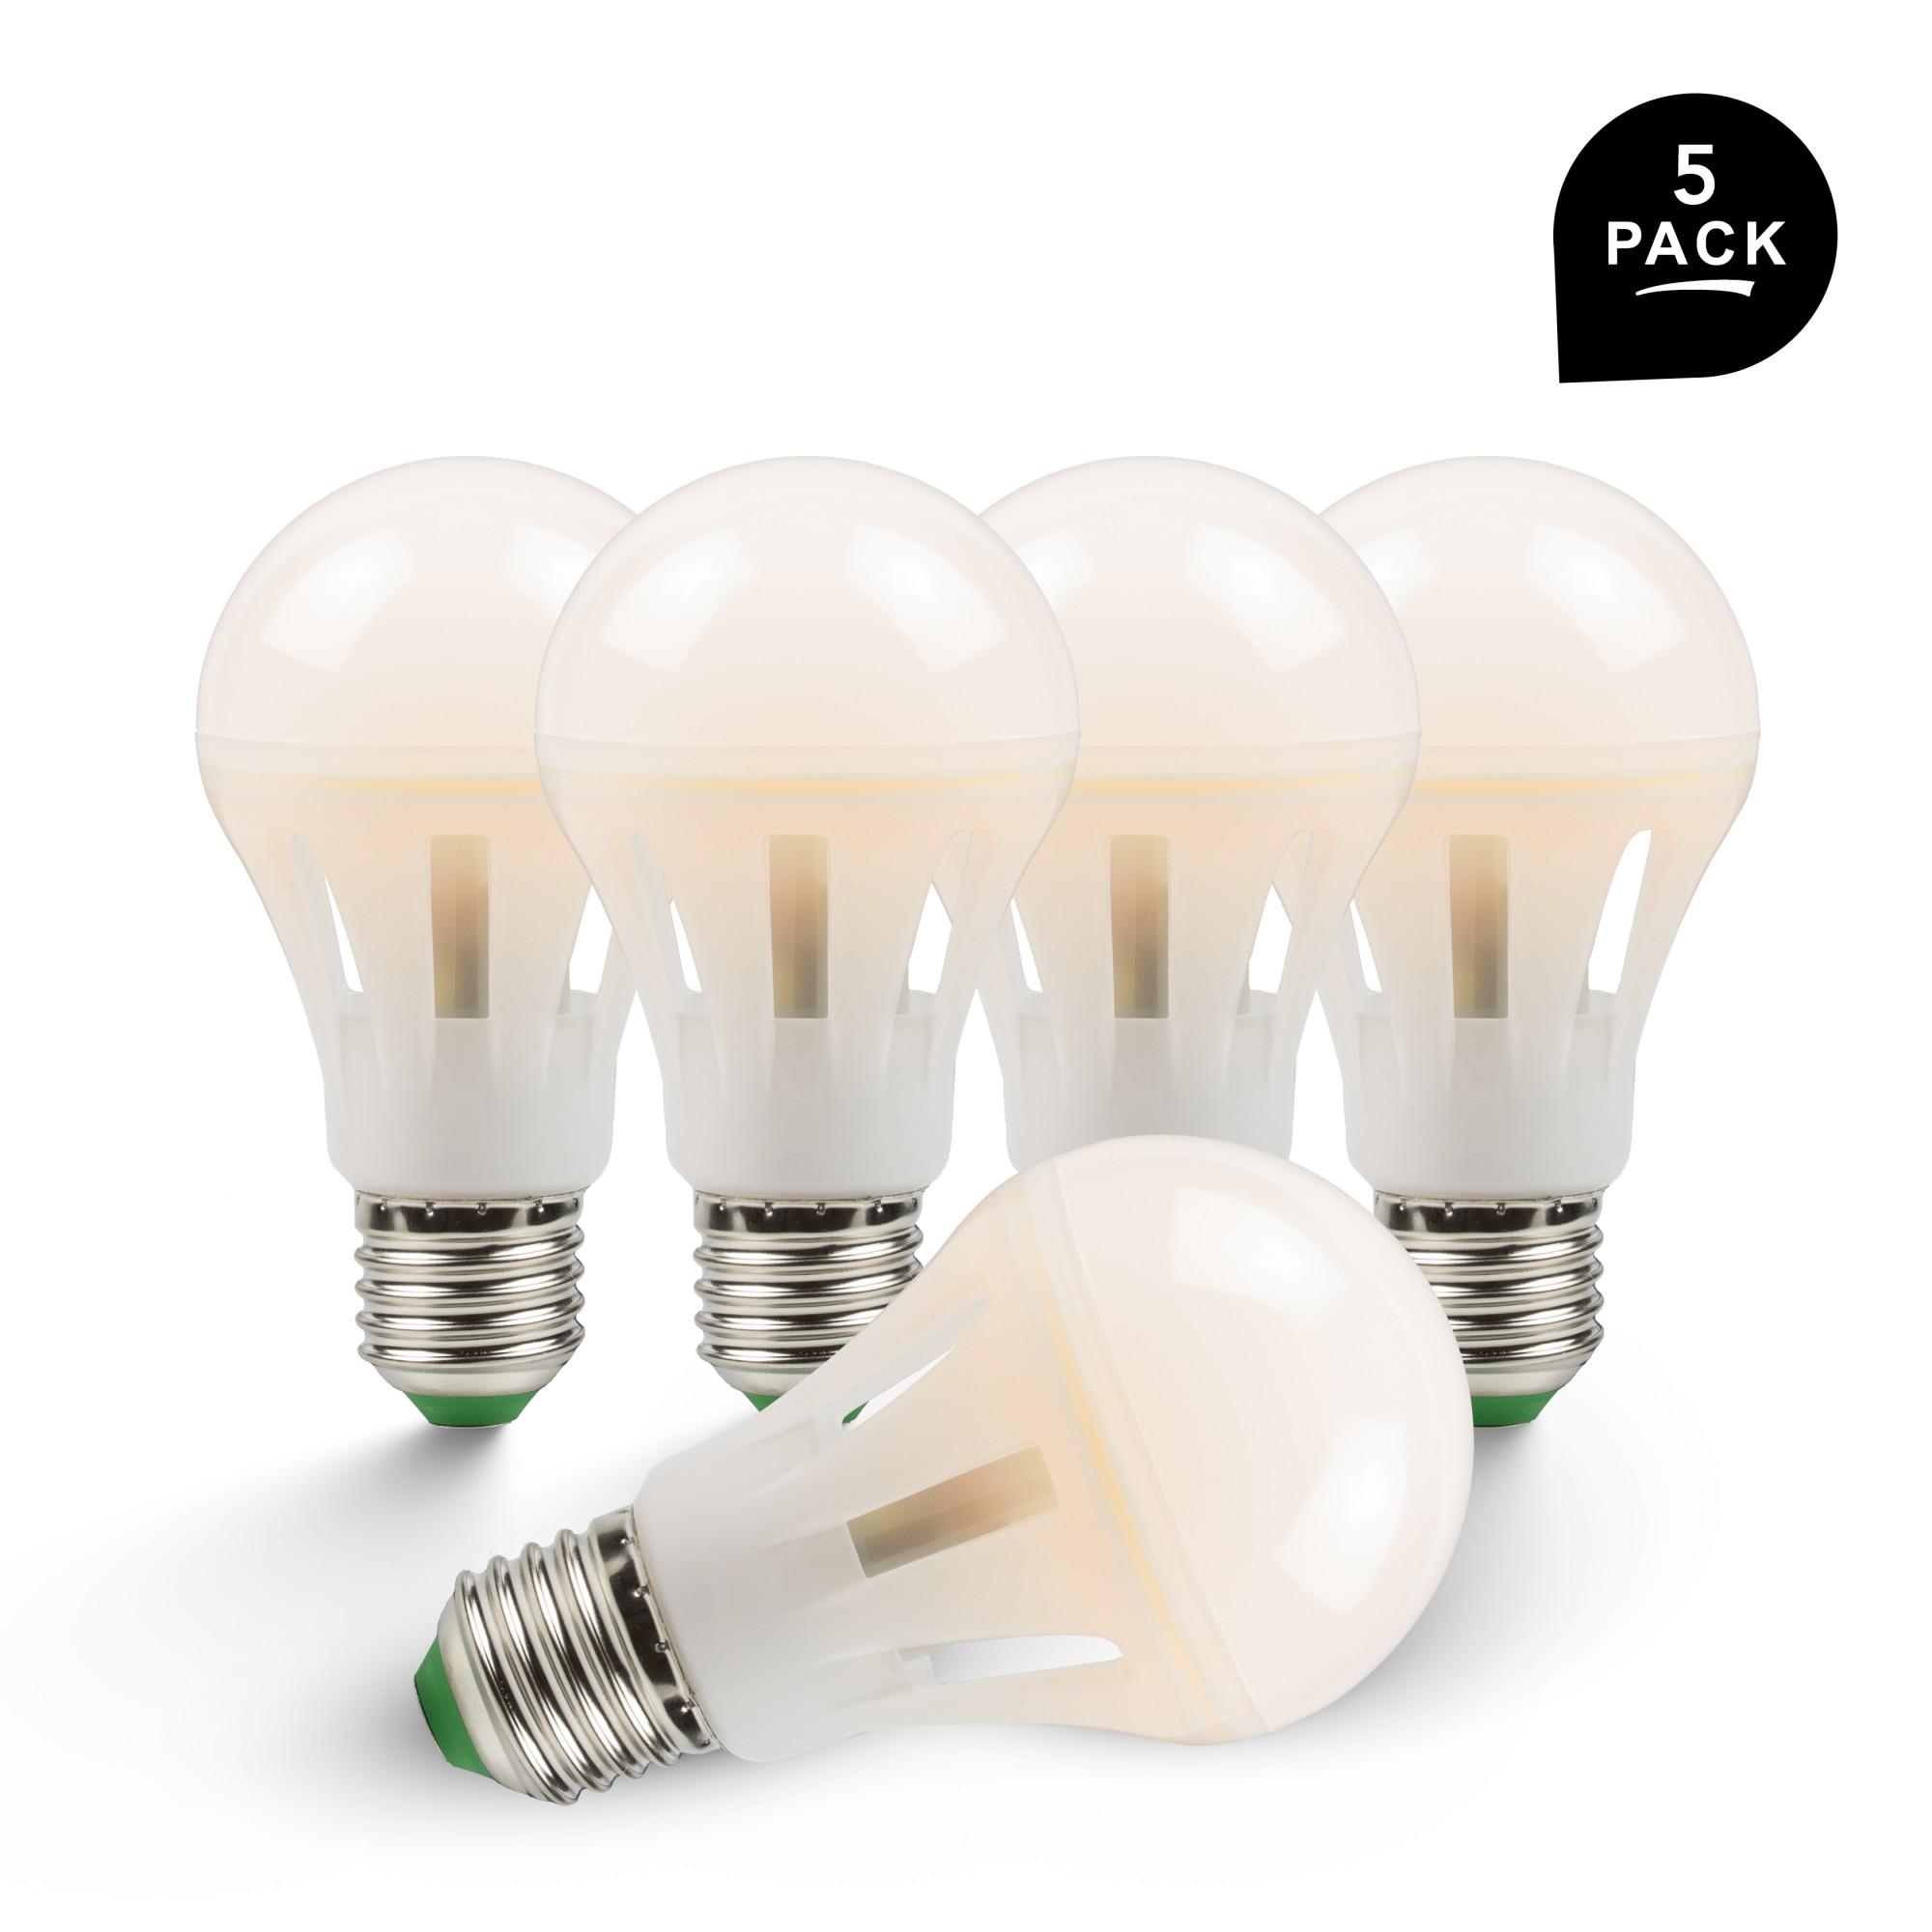 Onwijs Paket] 5 Stück LED Lampe E27 10W, 2700K Warmweiß, 360 PF-06